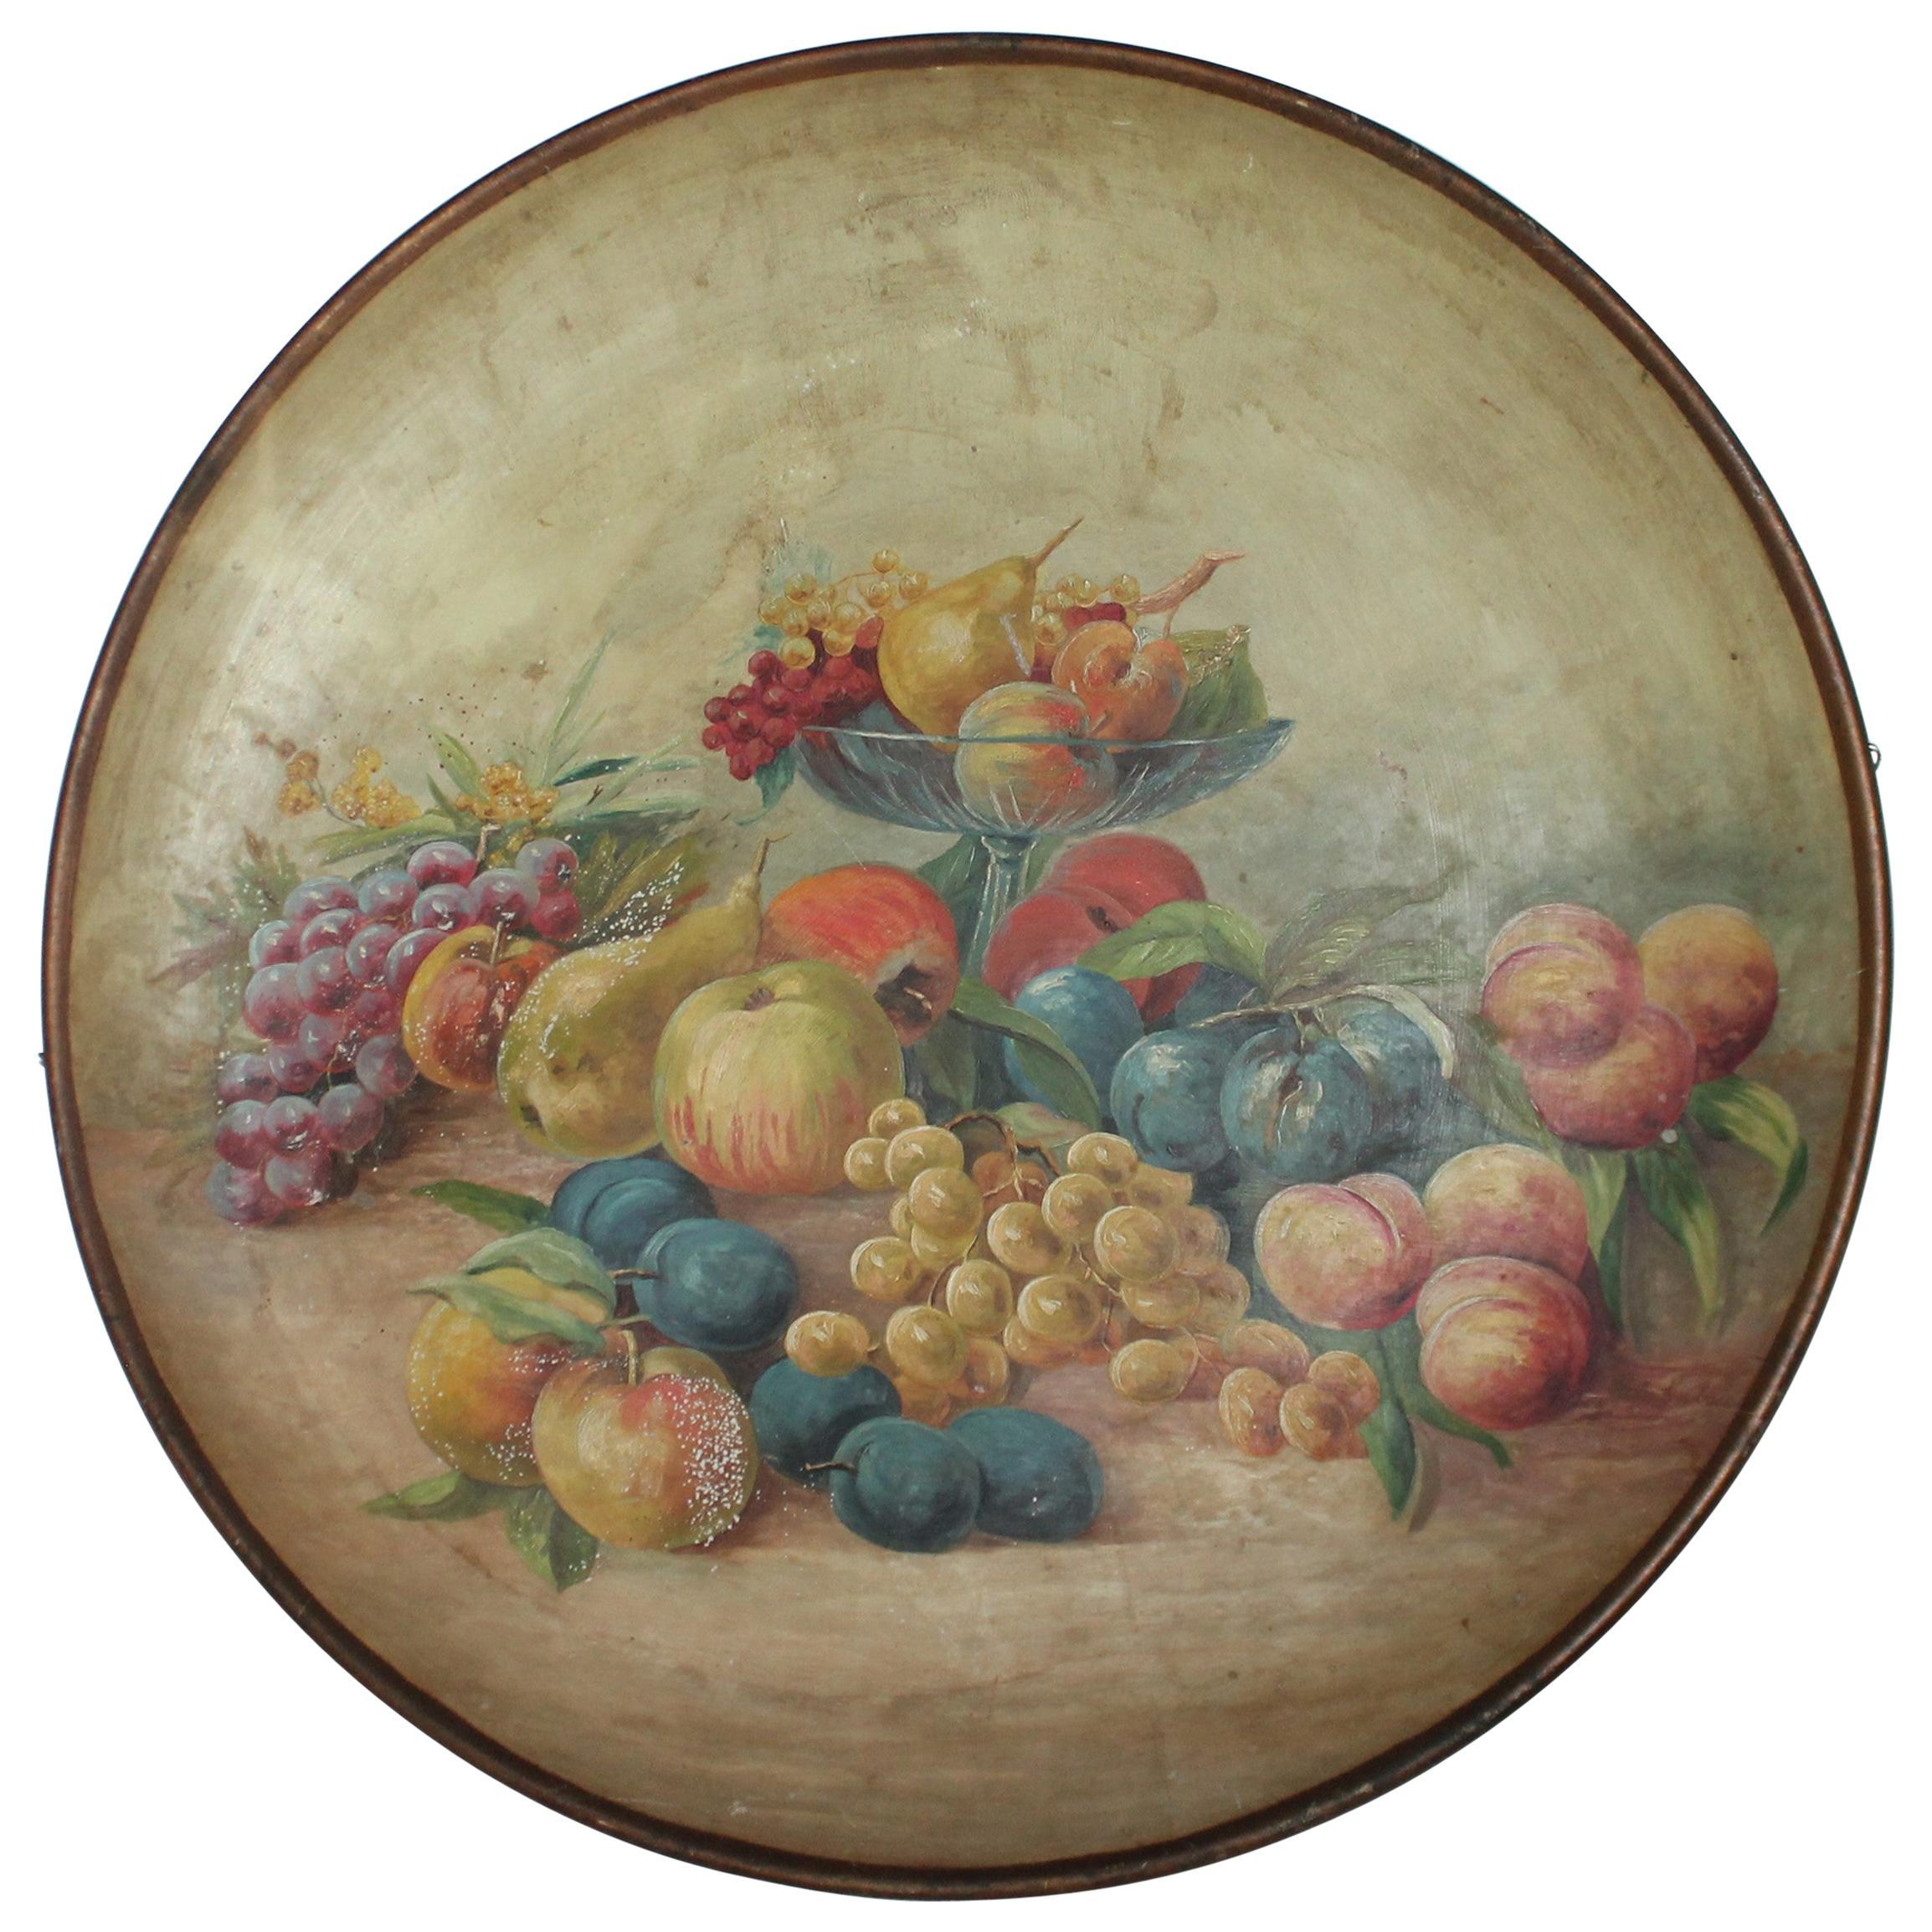 19th Century Still Life Oil Painting Signed Otto C. Kuban, Laguna Beach, Calif